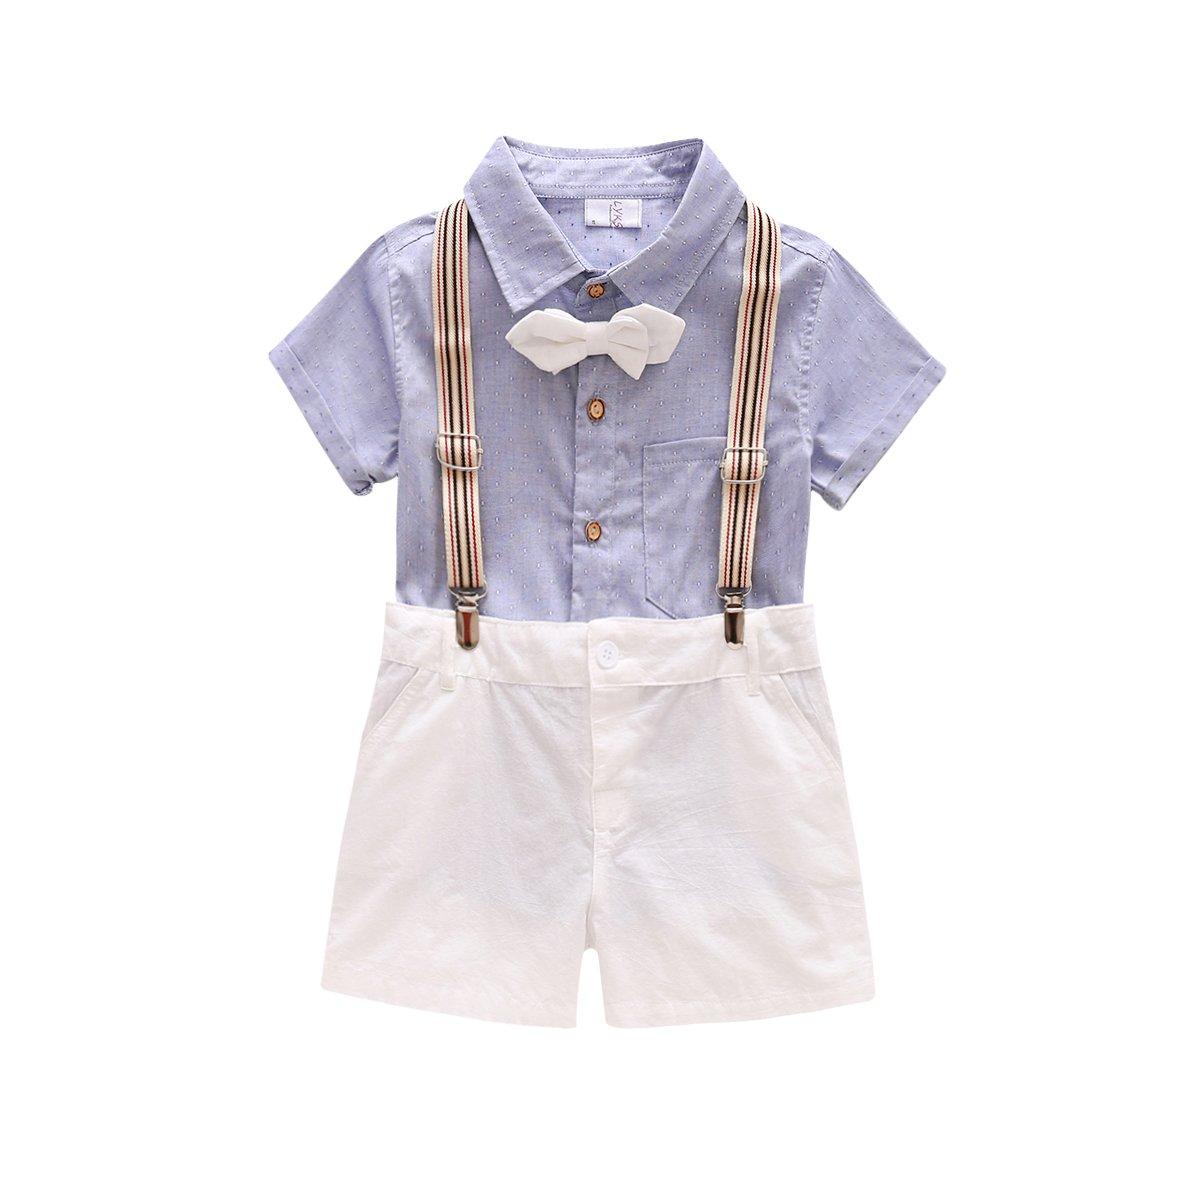 Kids Boys Outfits set (7T)